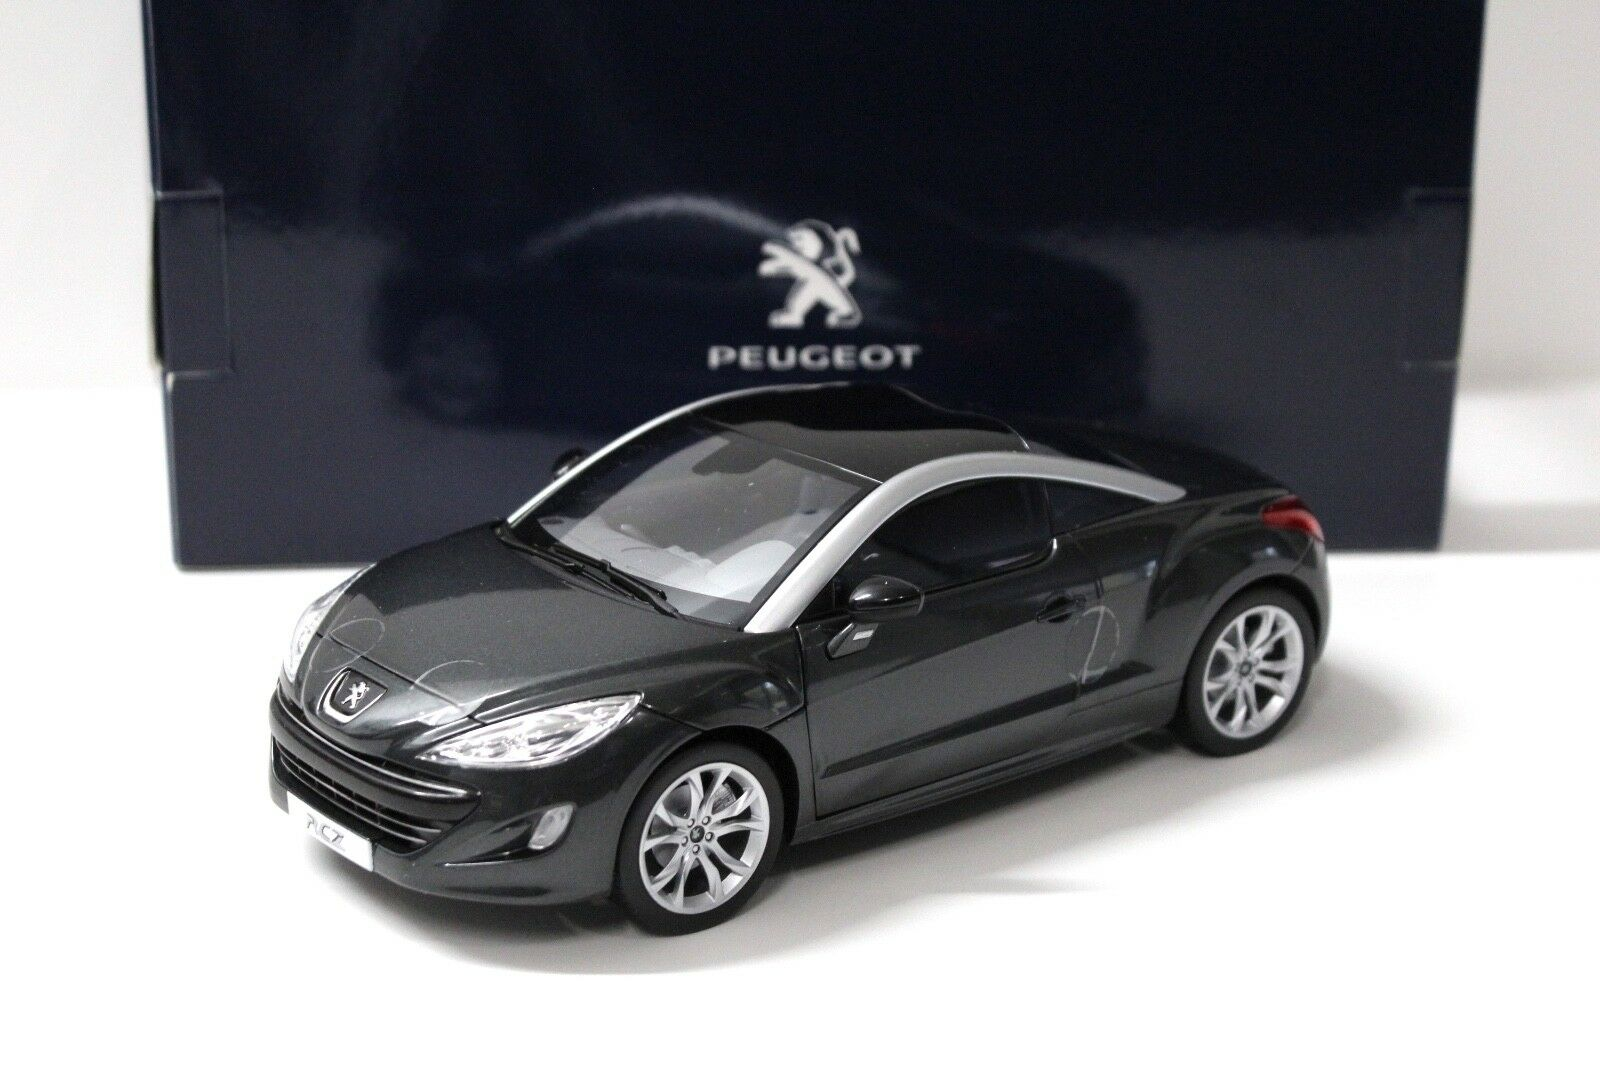 1 18 Norev Peugeot RCZ haria grey DEALER NEW bei PREMIUM-MODELCARS